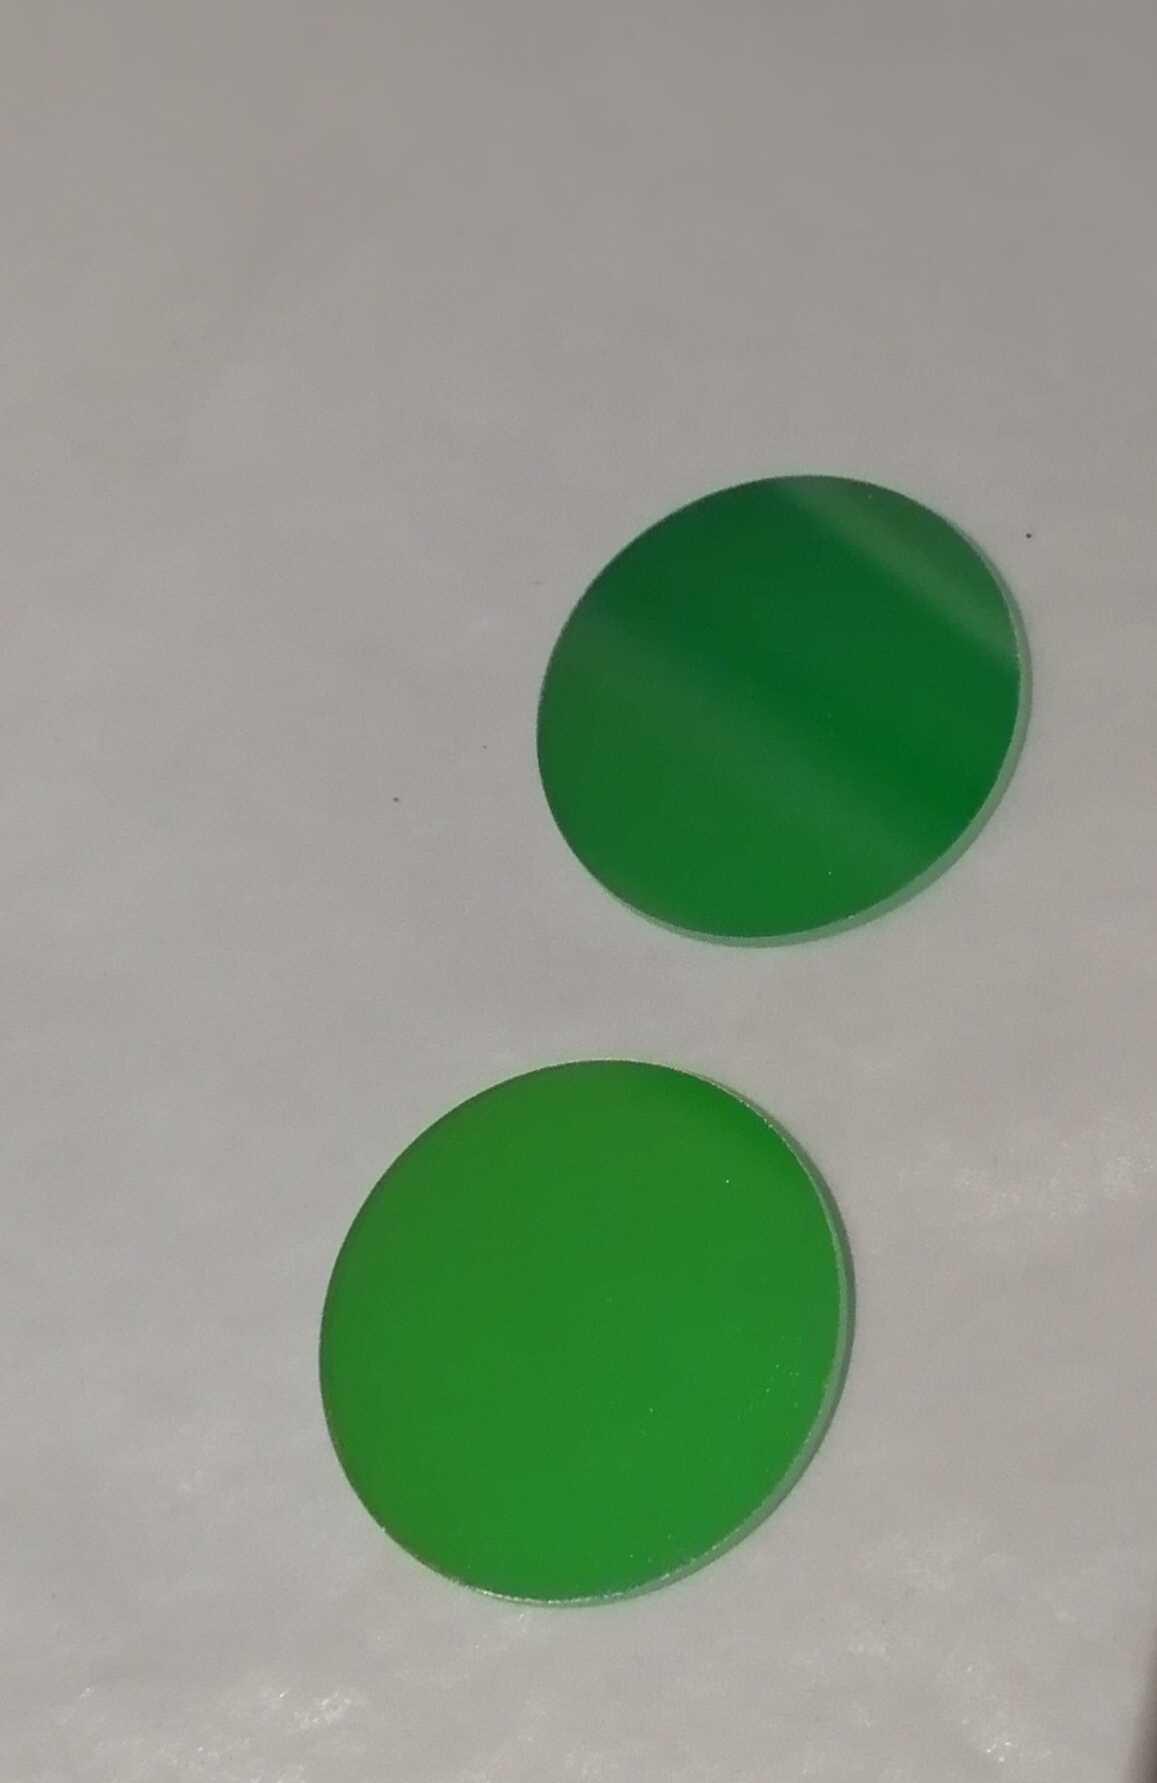 Filtre ~ filtre vert ~ filtre à bande étroite   535nm 550nm, ~ filtre à haute Transmittance, ~